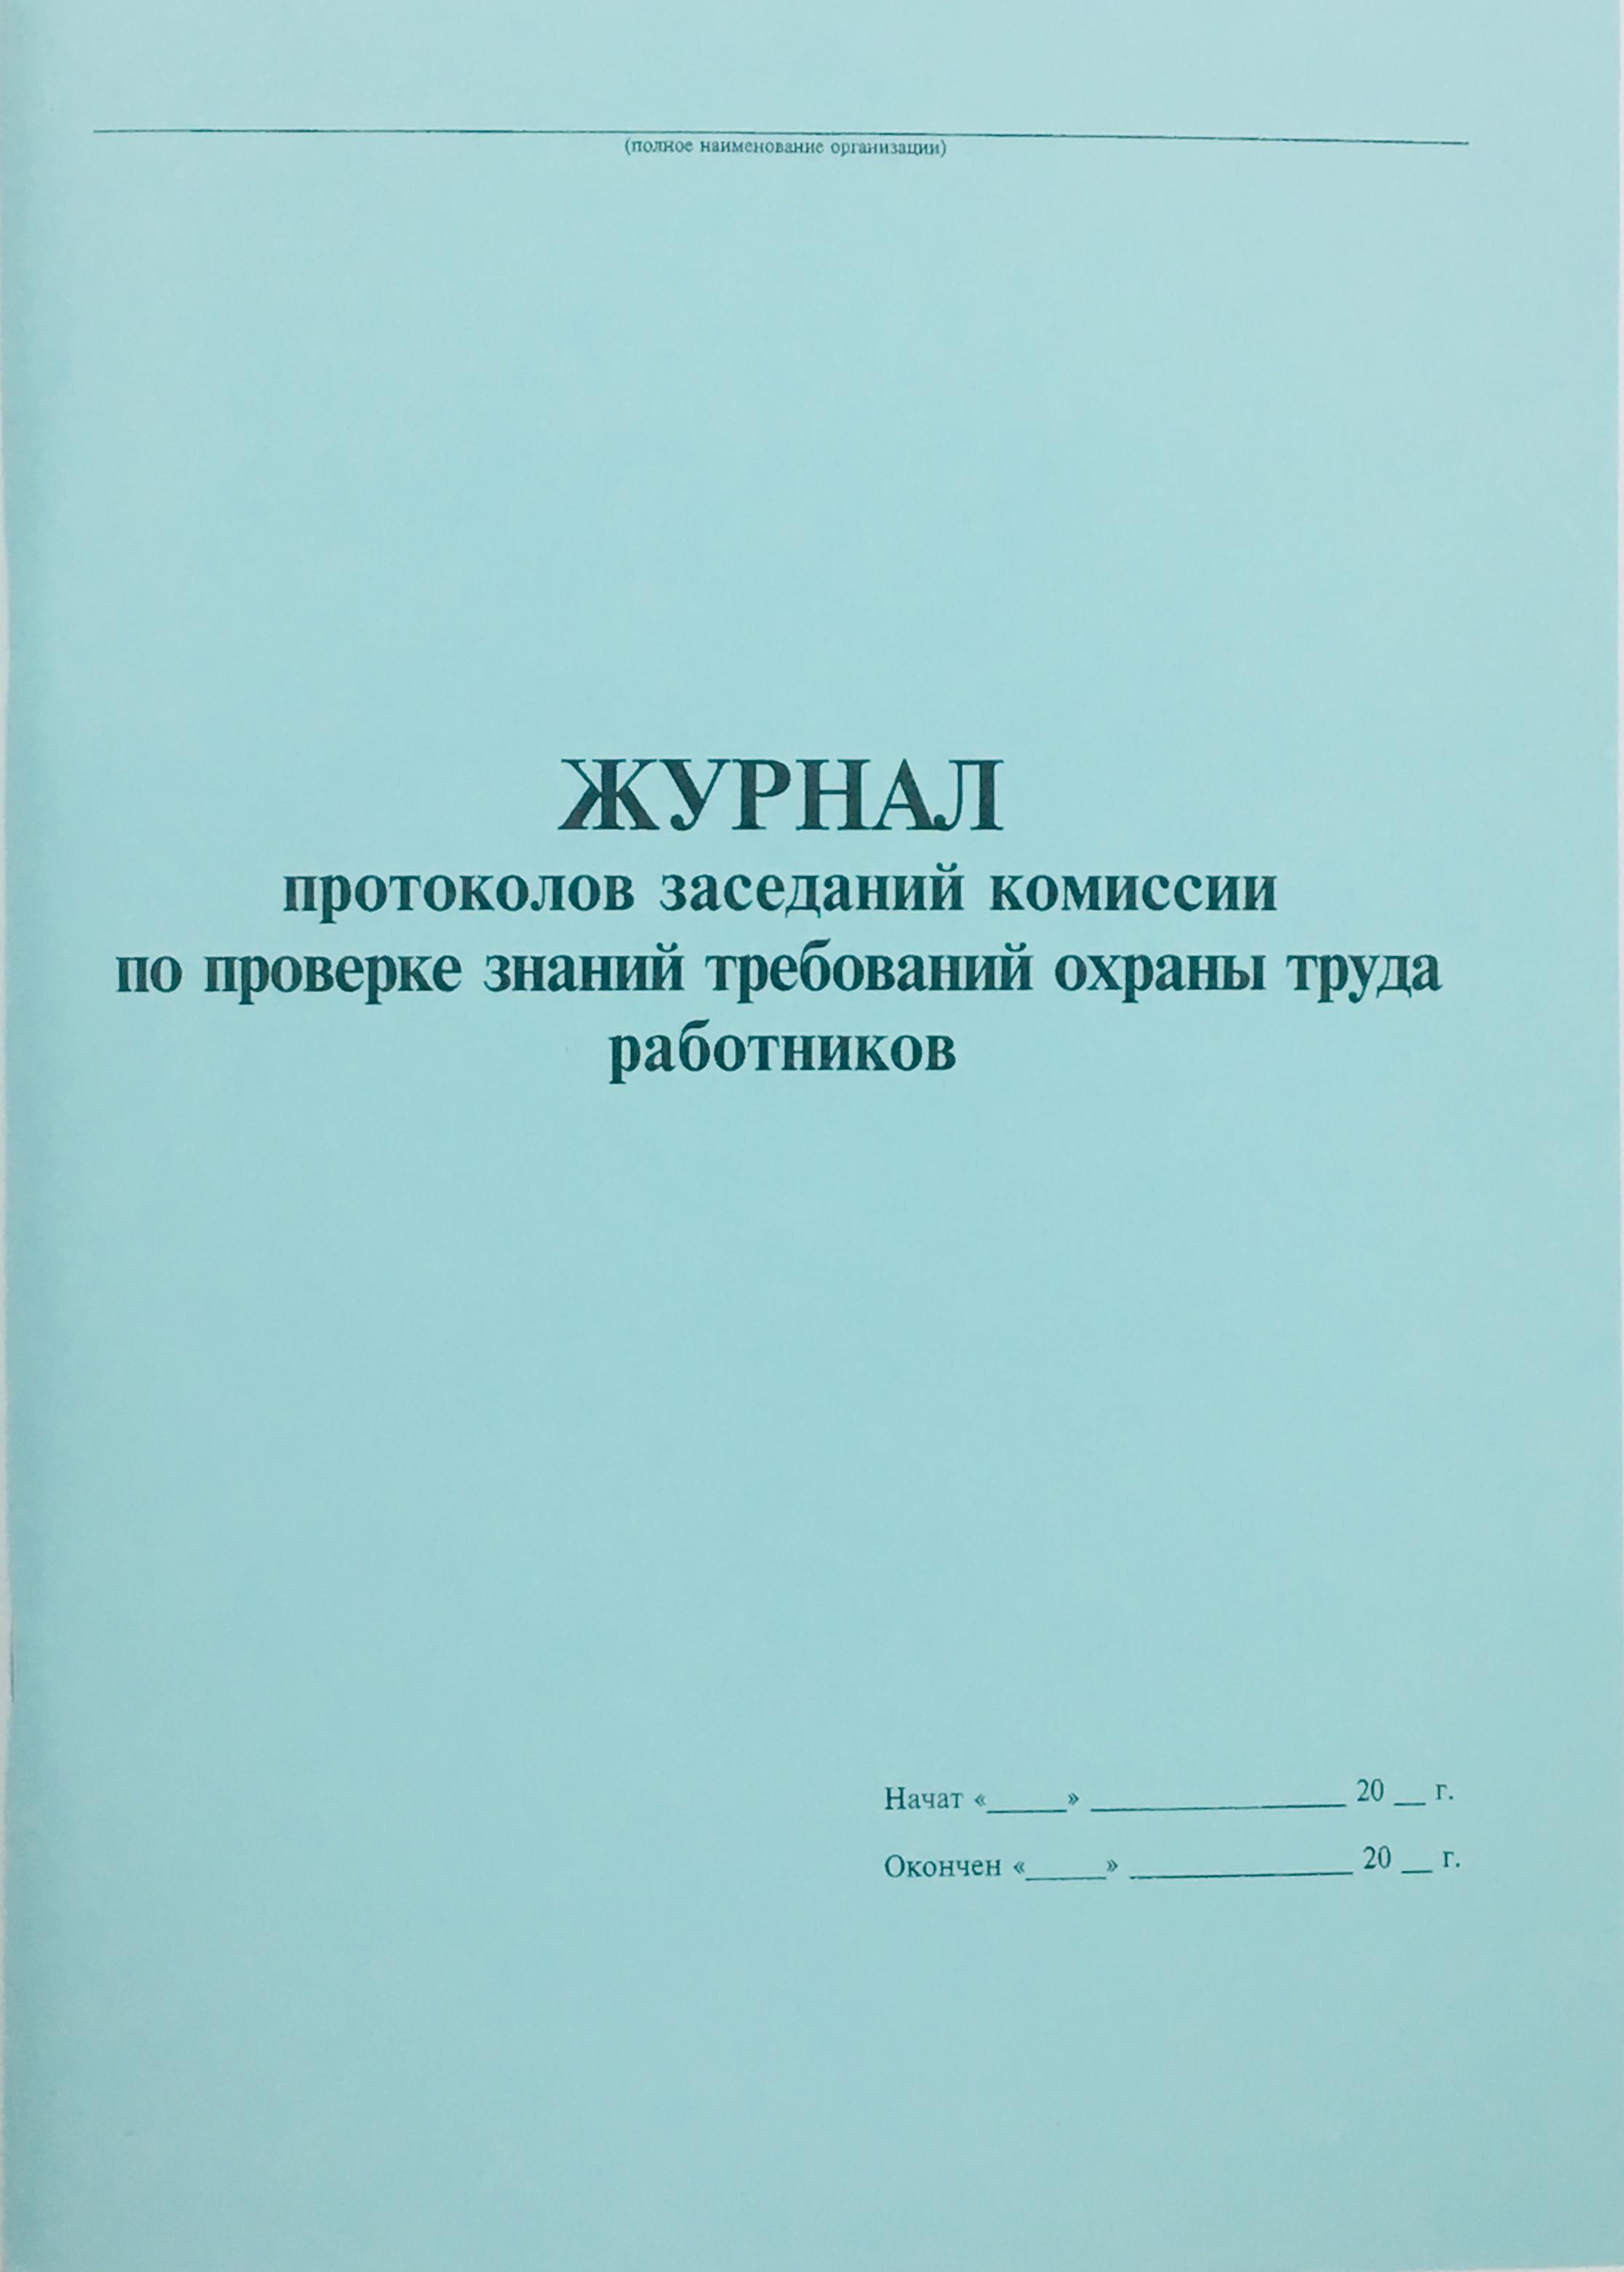 Журнал протоколов заседаний комиссии по проверке знаний по охране труда